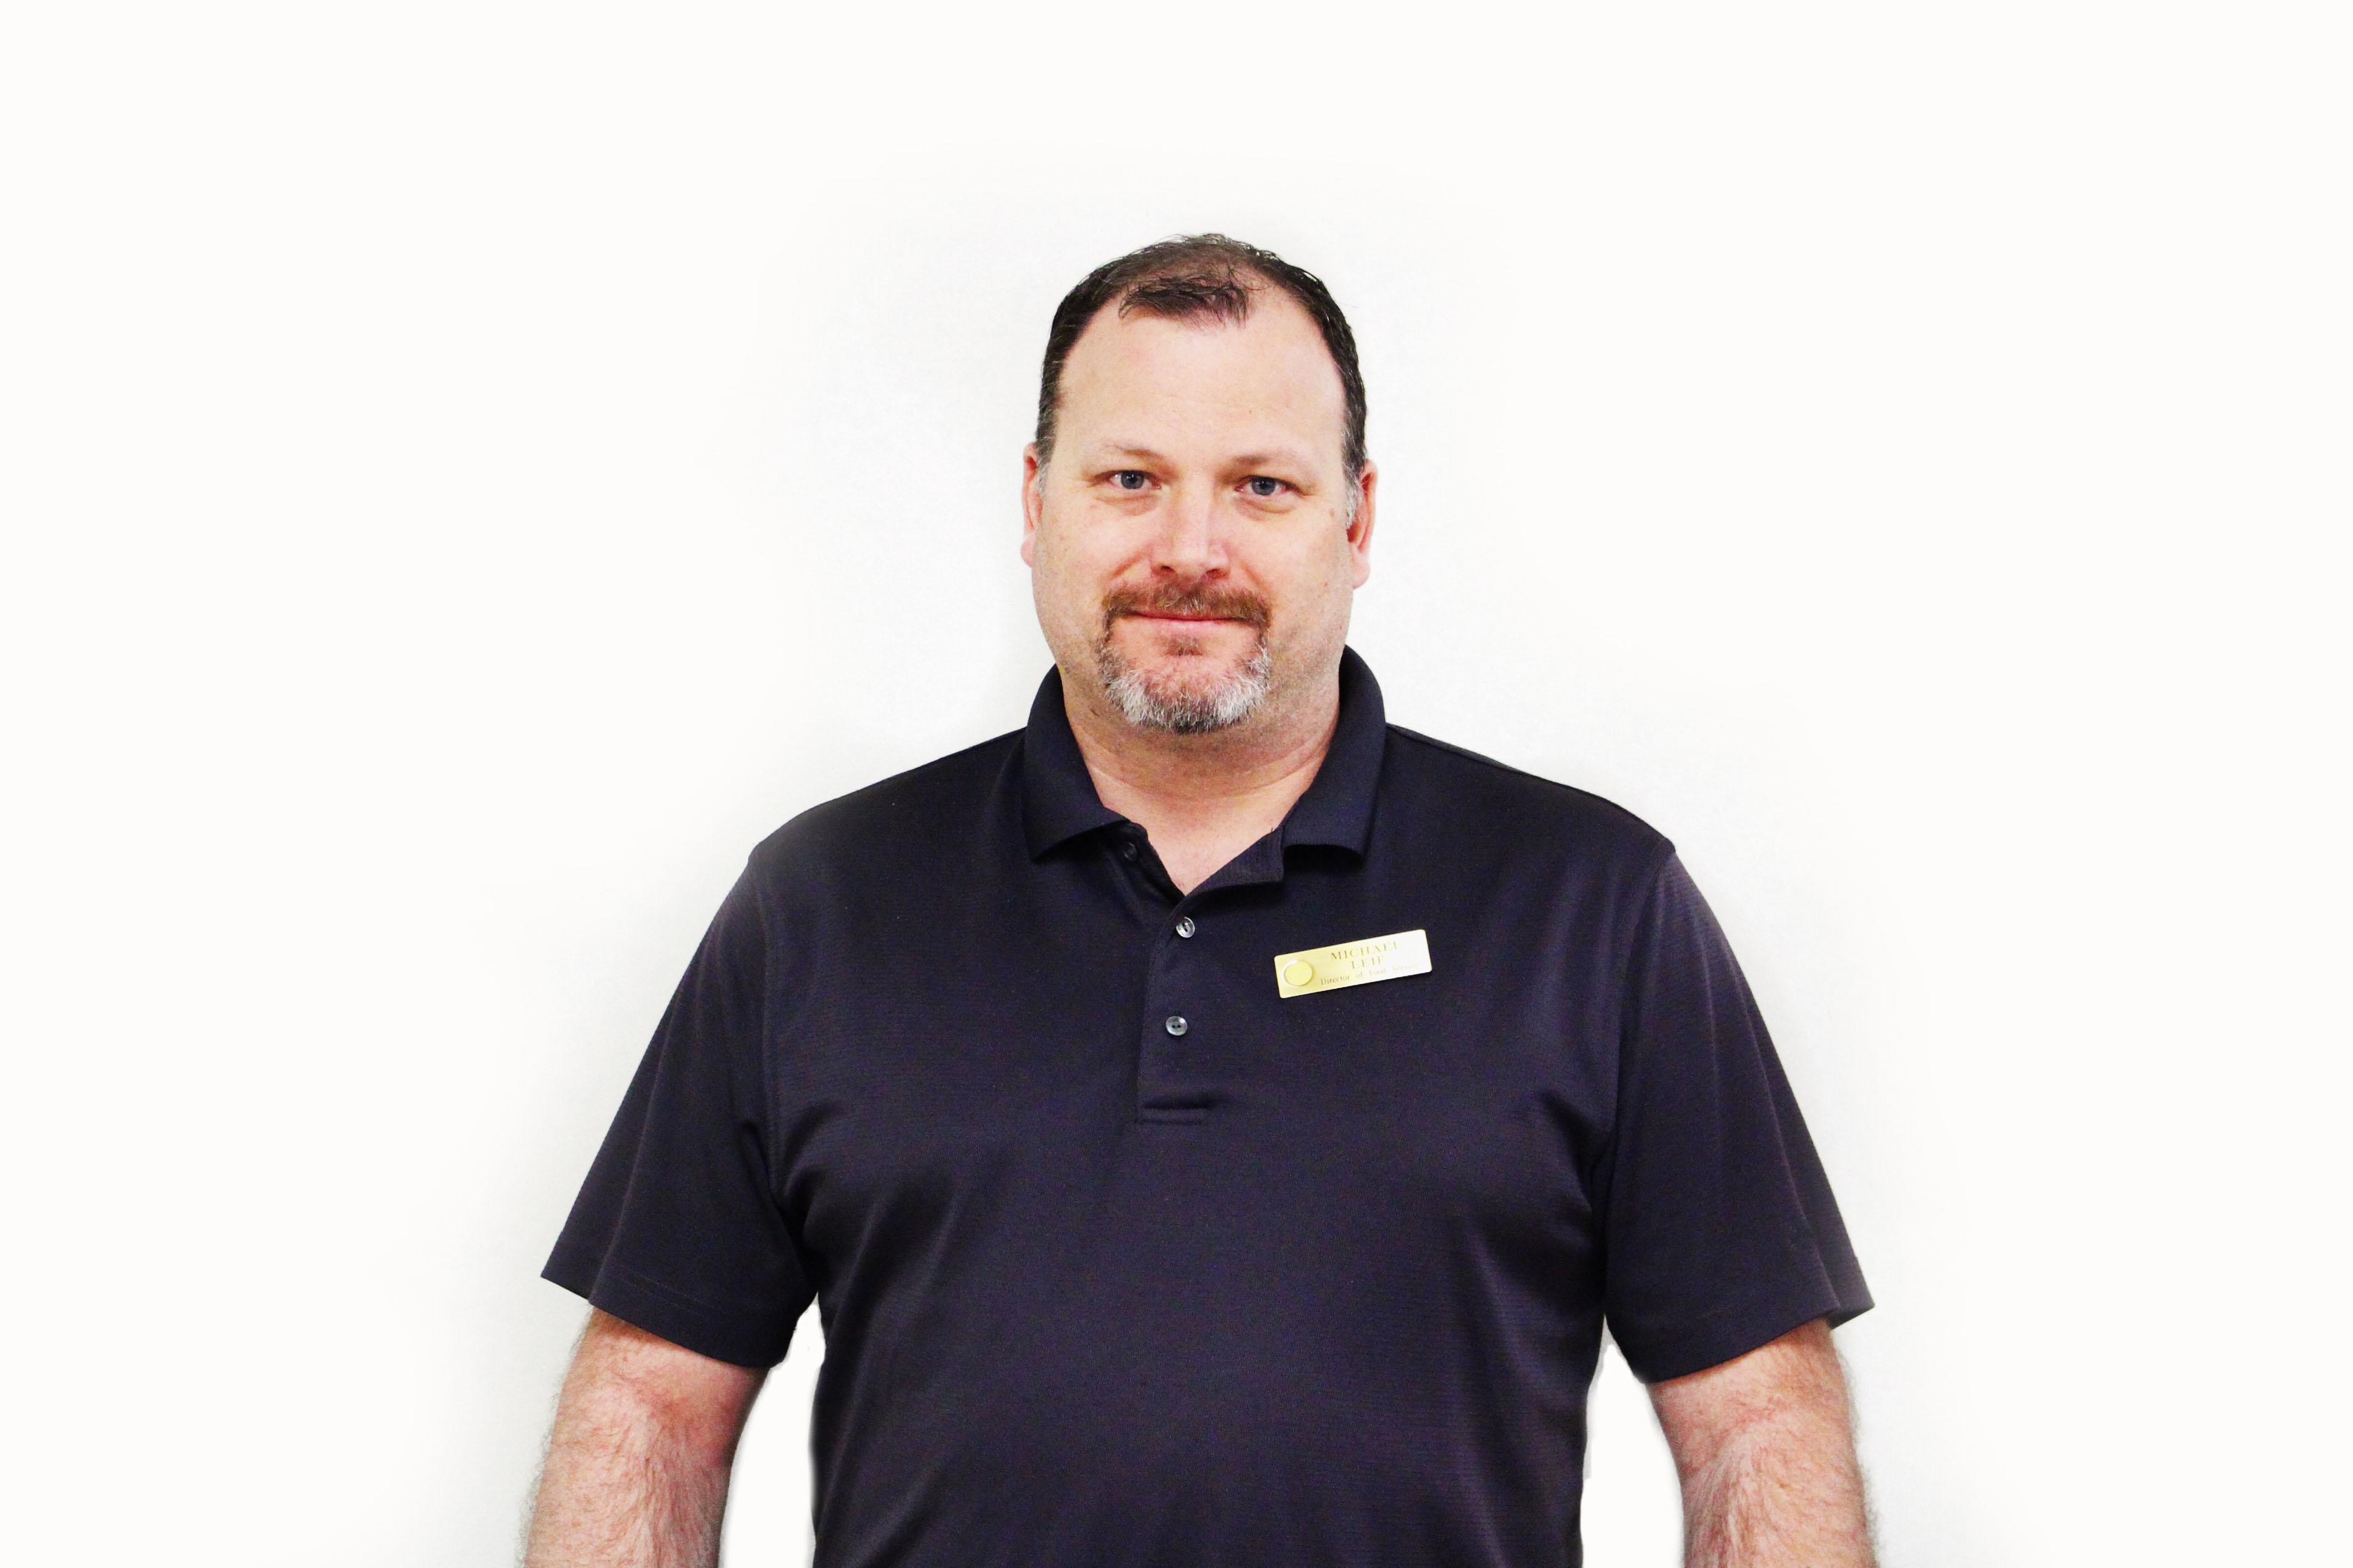 Michael Leif - Food Service Director